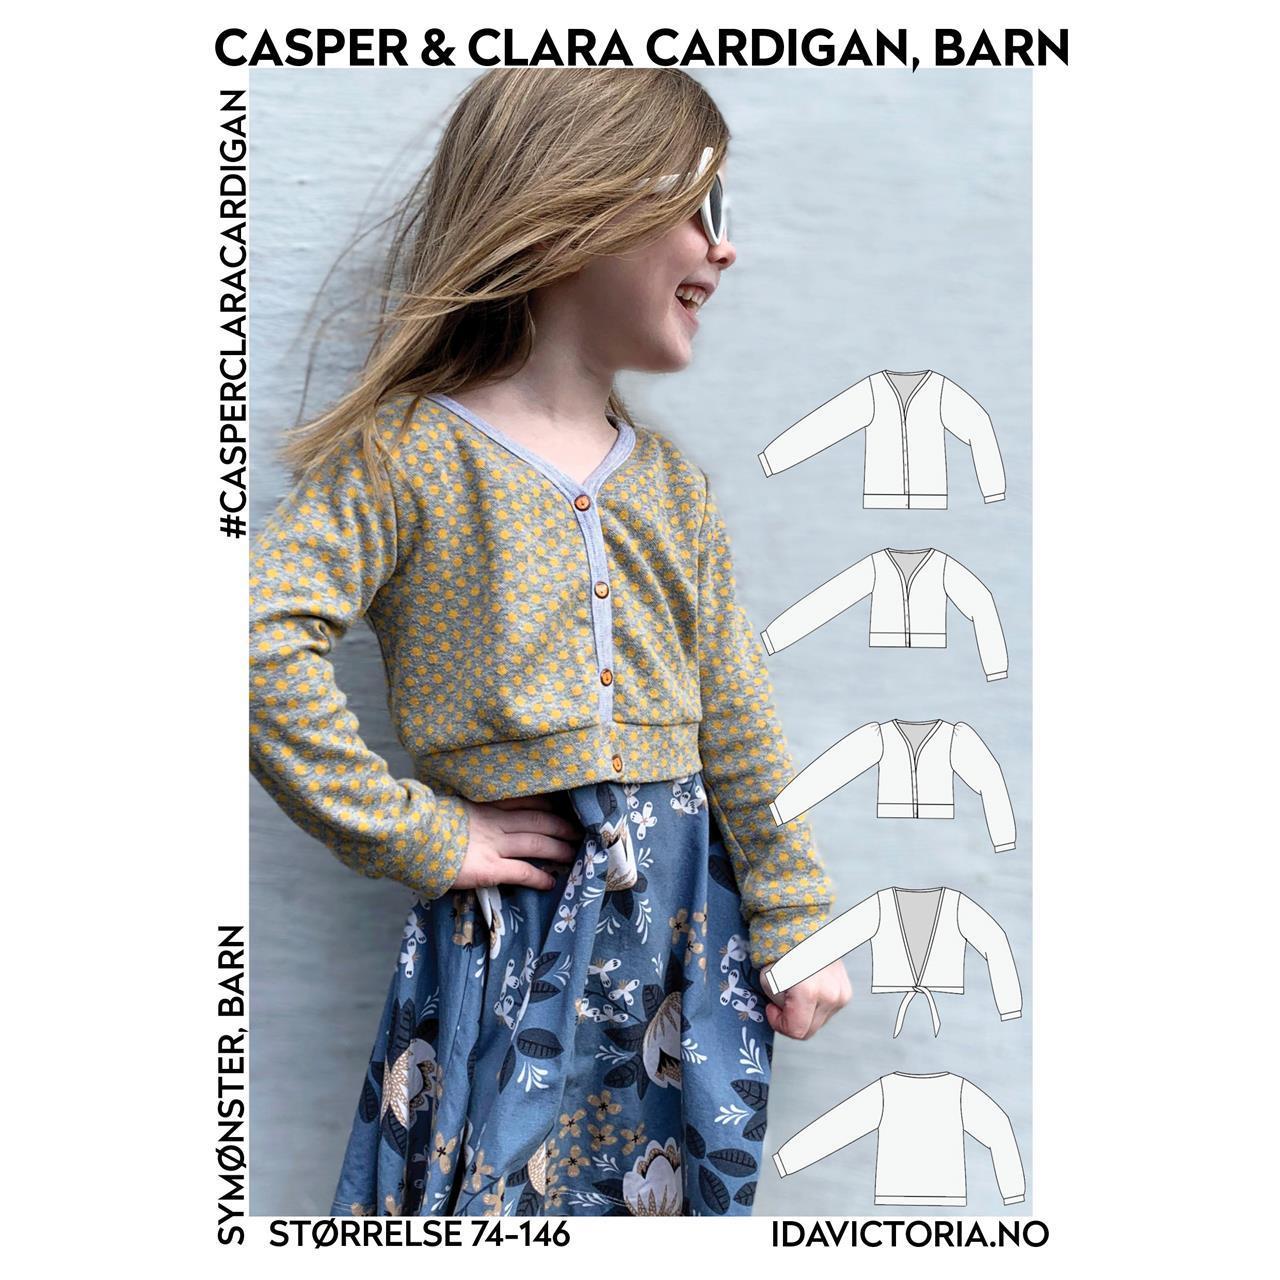 Casper og Clara Cardigan, barn